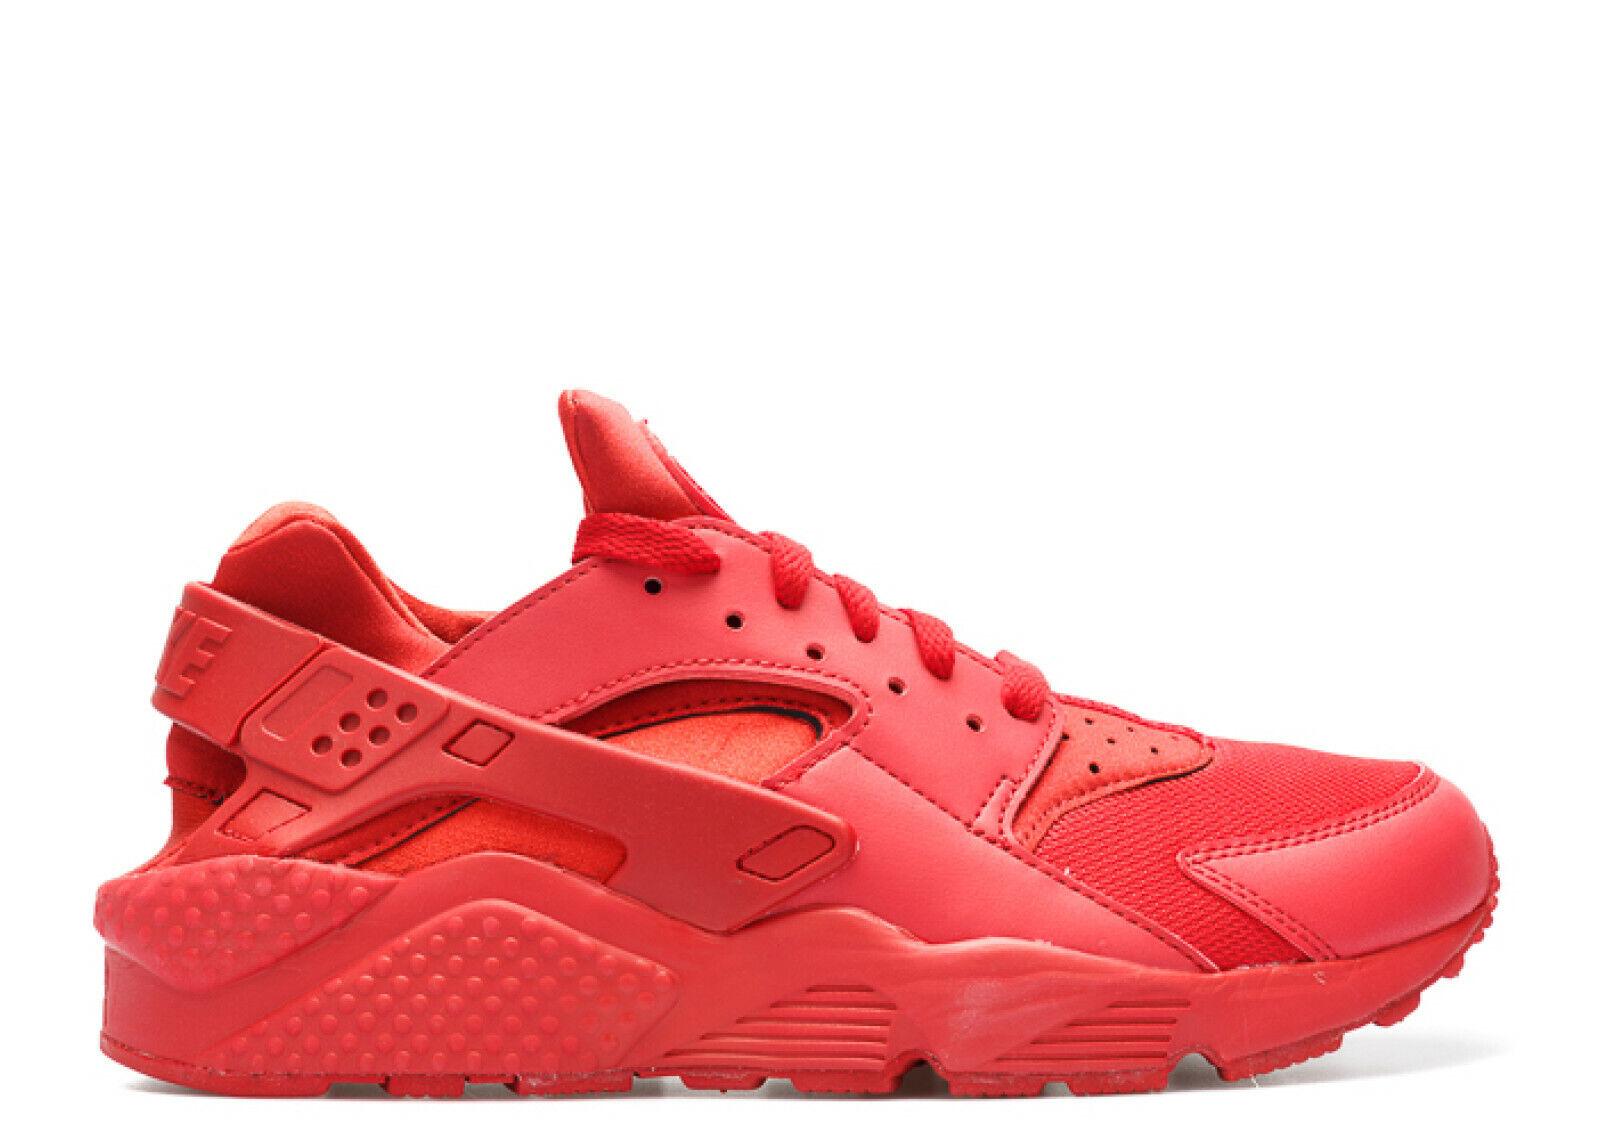 Hombre Nike Air Max 93 Zapatillas 306551 800 Naranjas